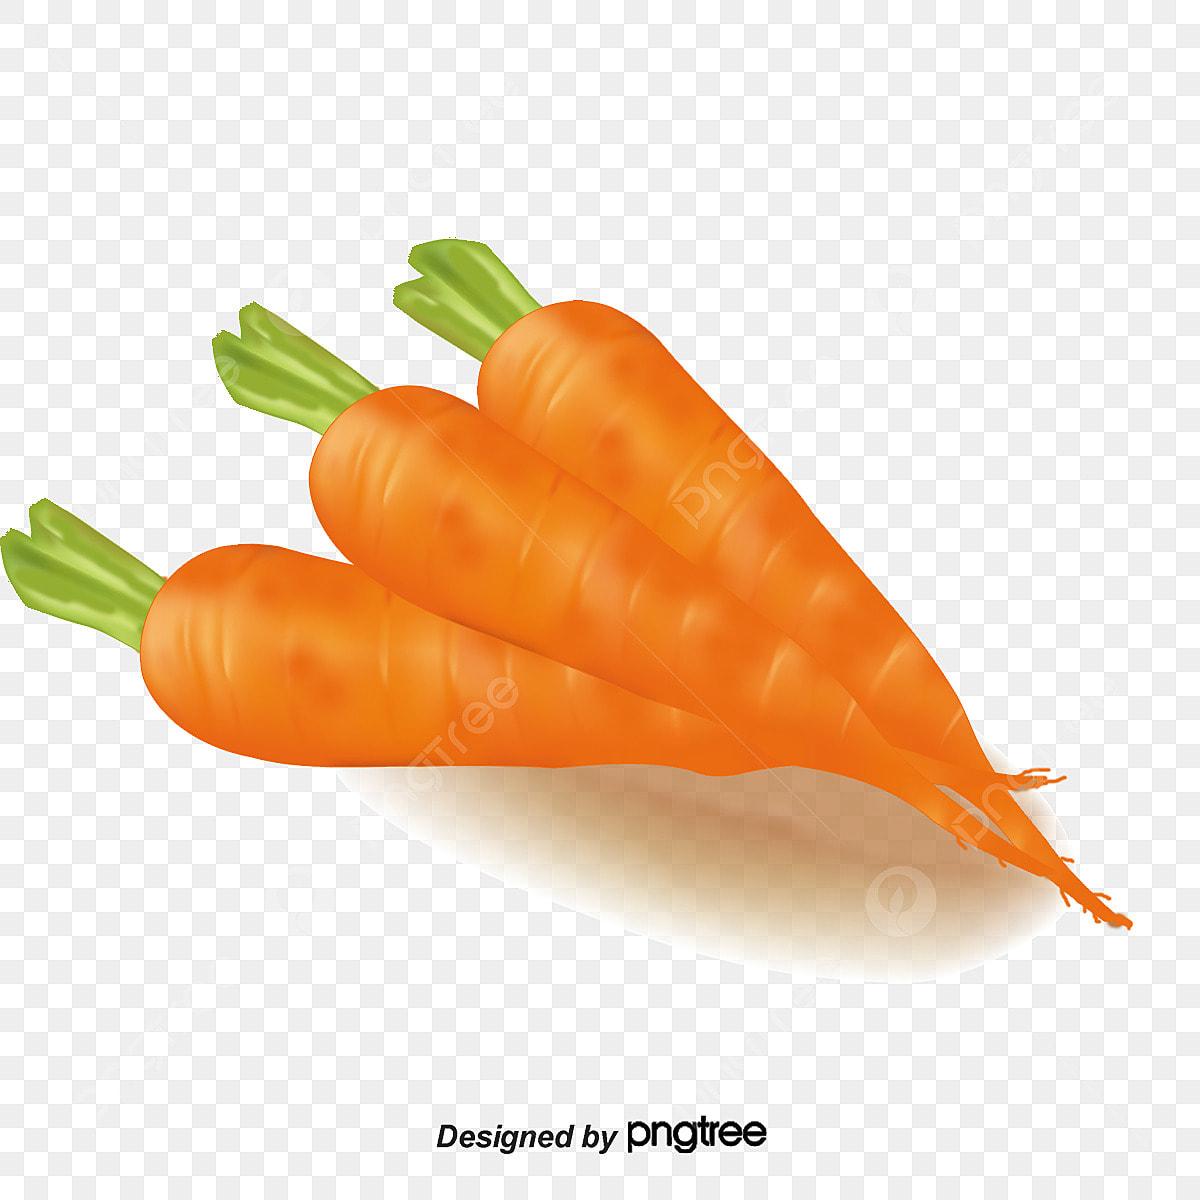 Zanahoria Zanahoria Verde Verduras Png Y Psd Para Descargar Gratis Pngtree Se pueden obtener al matar zombis. https es pngtree com freepng carrot 1536979 html